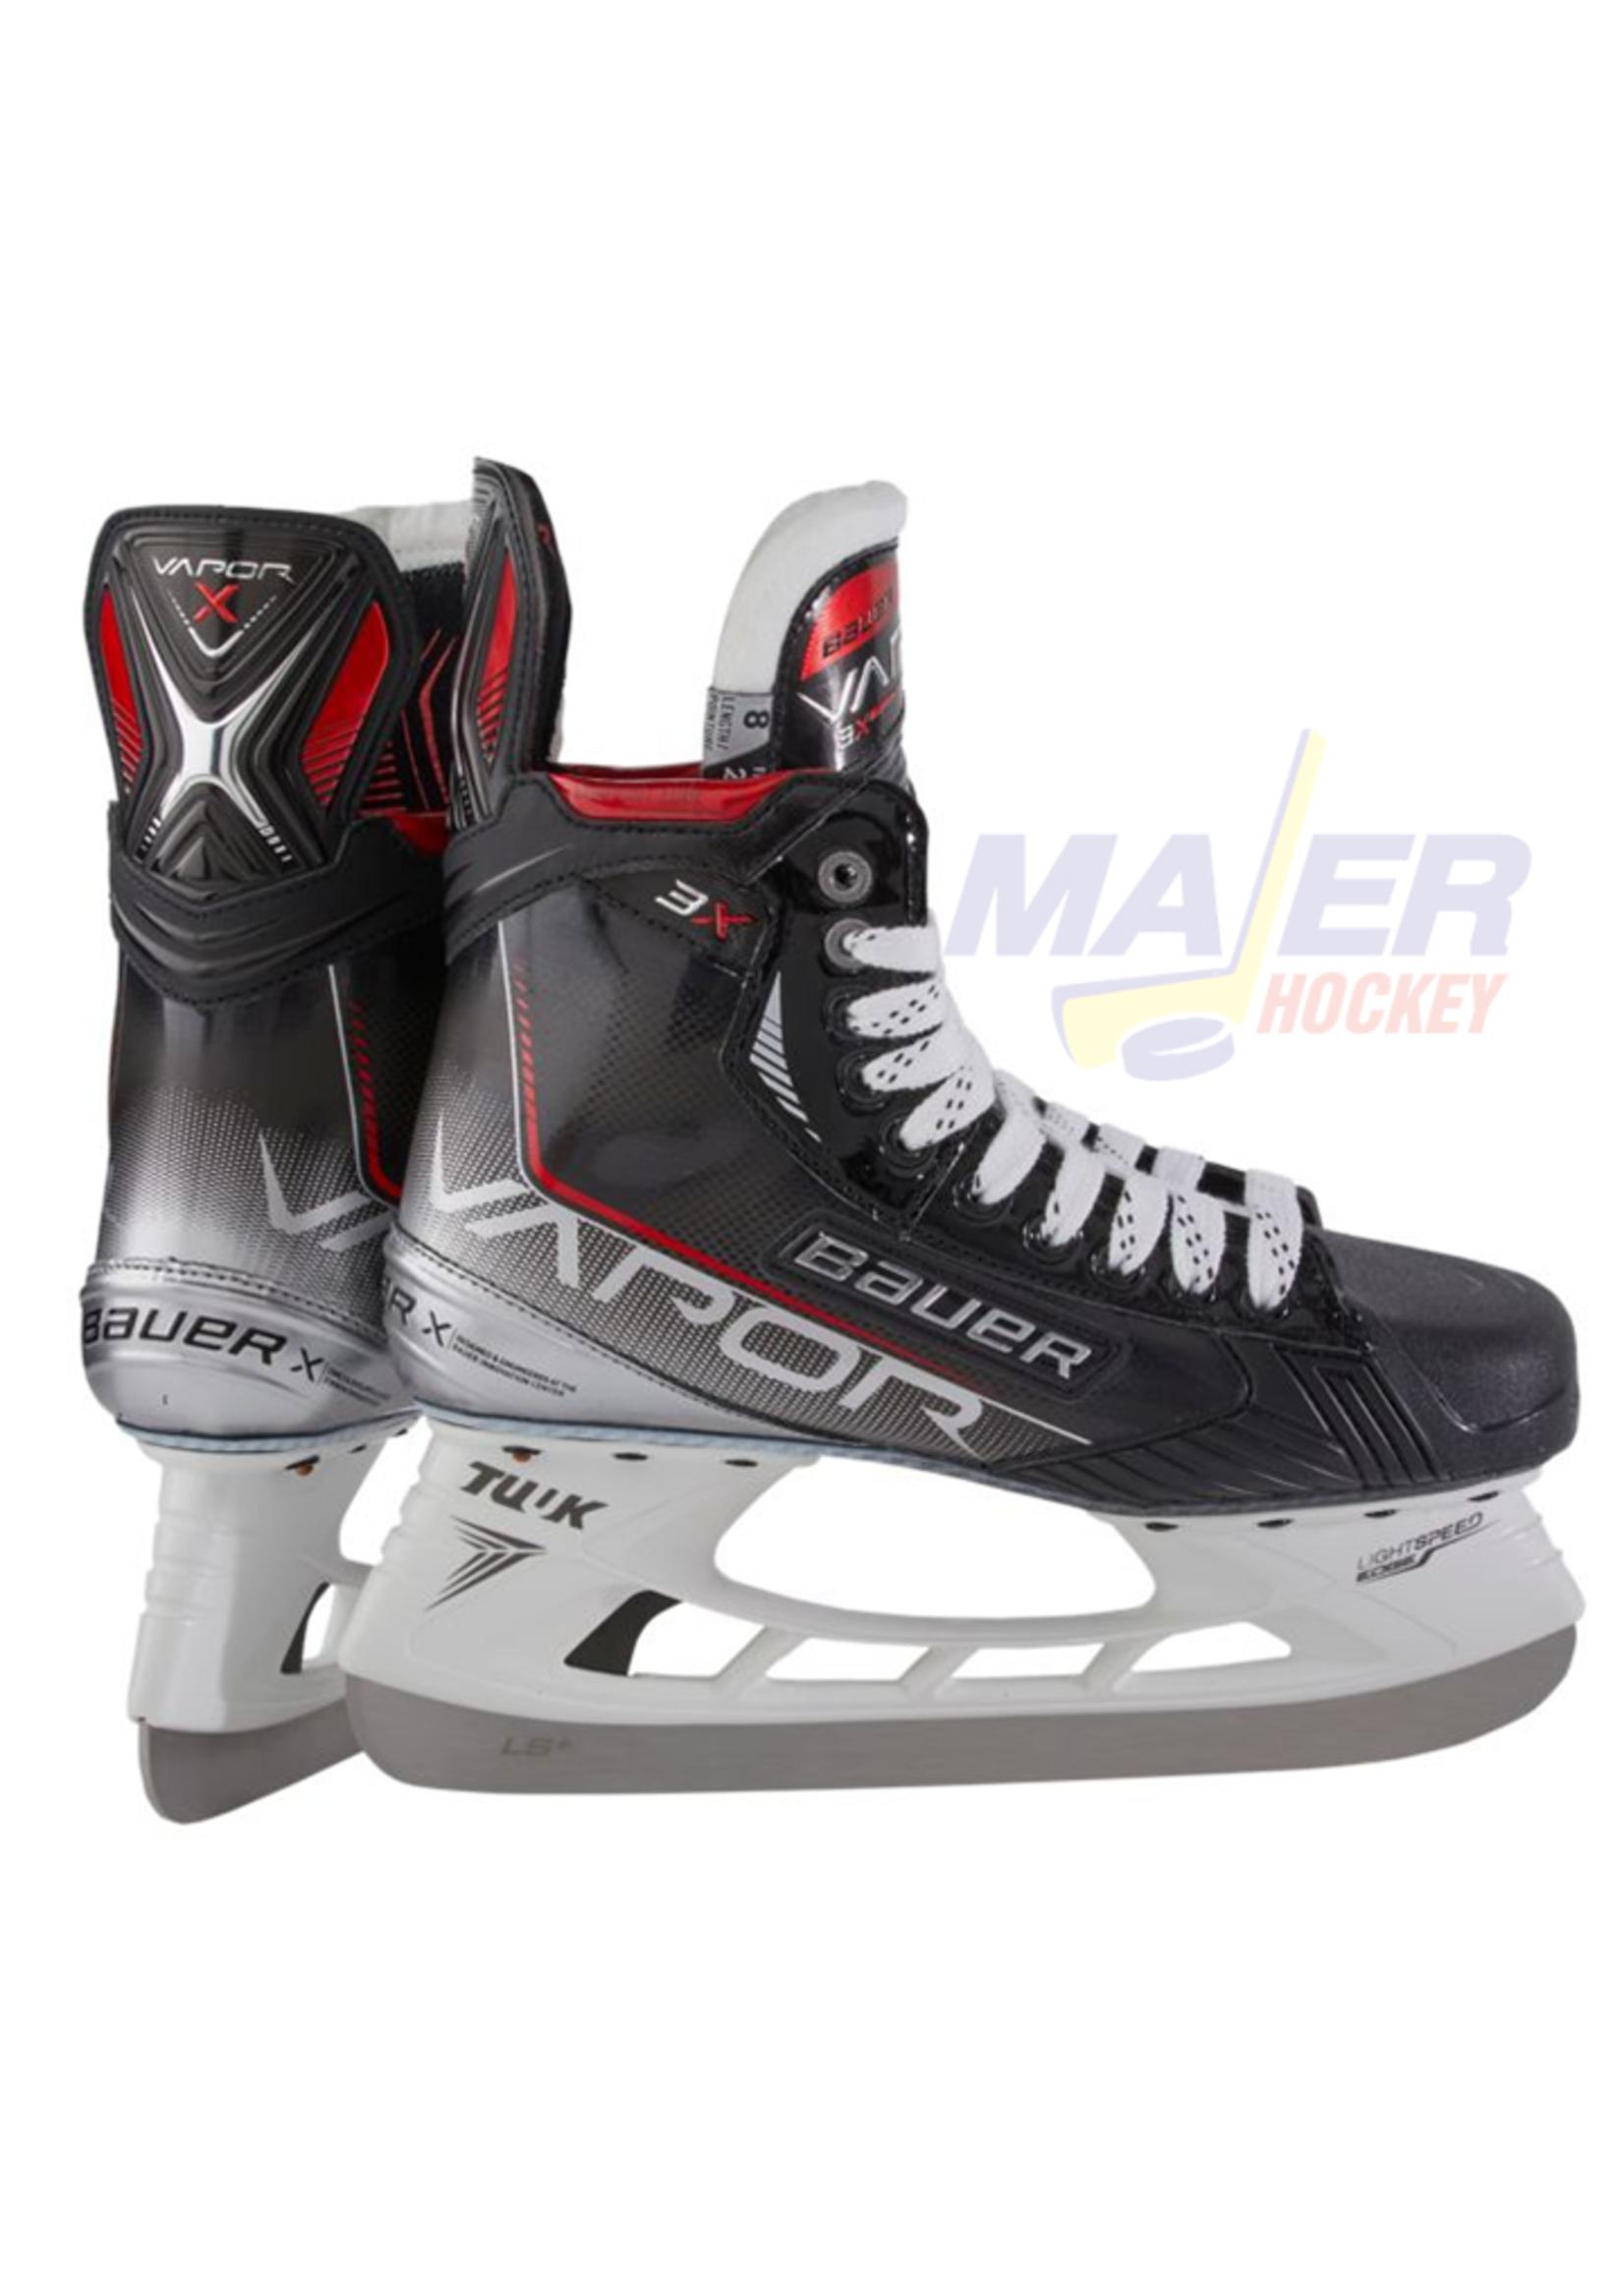 Bauer Vapor 3X Jr skates